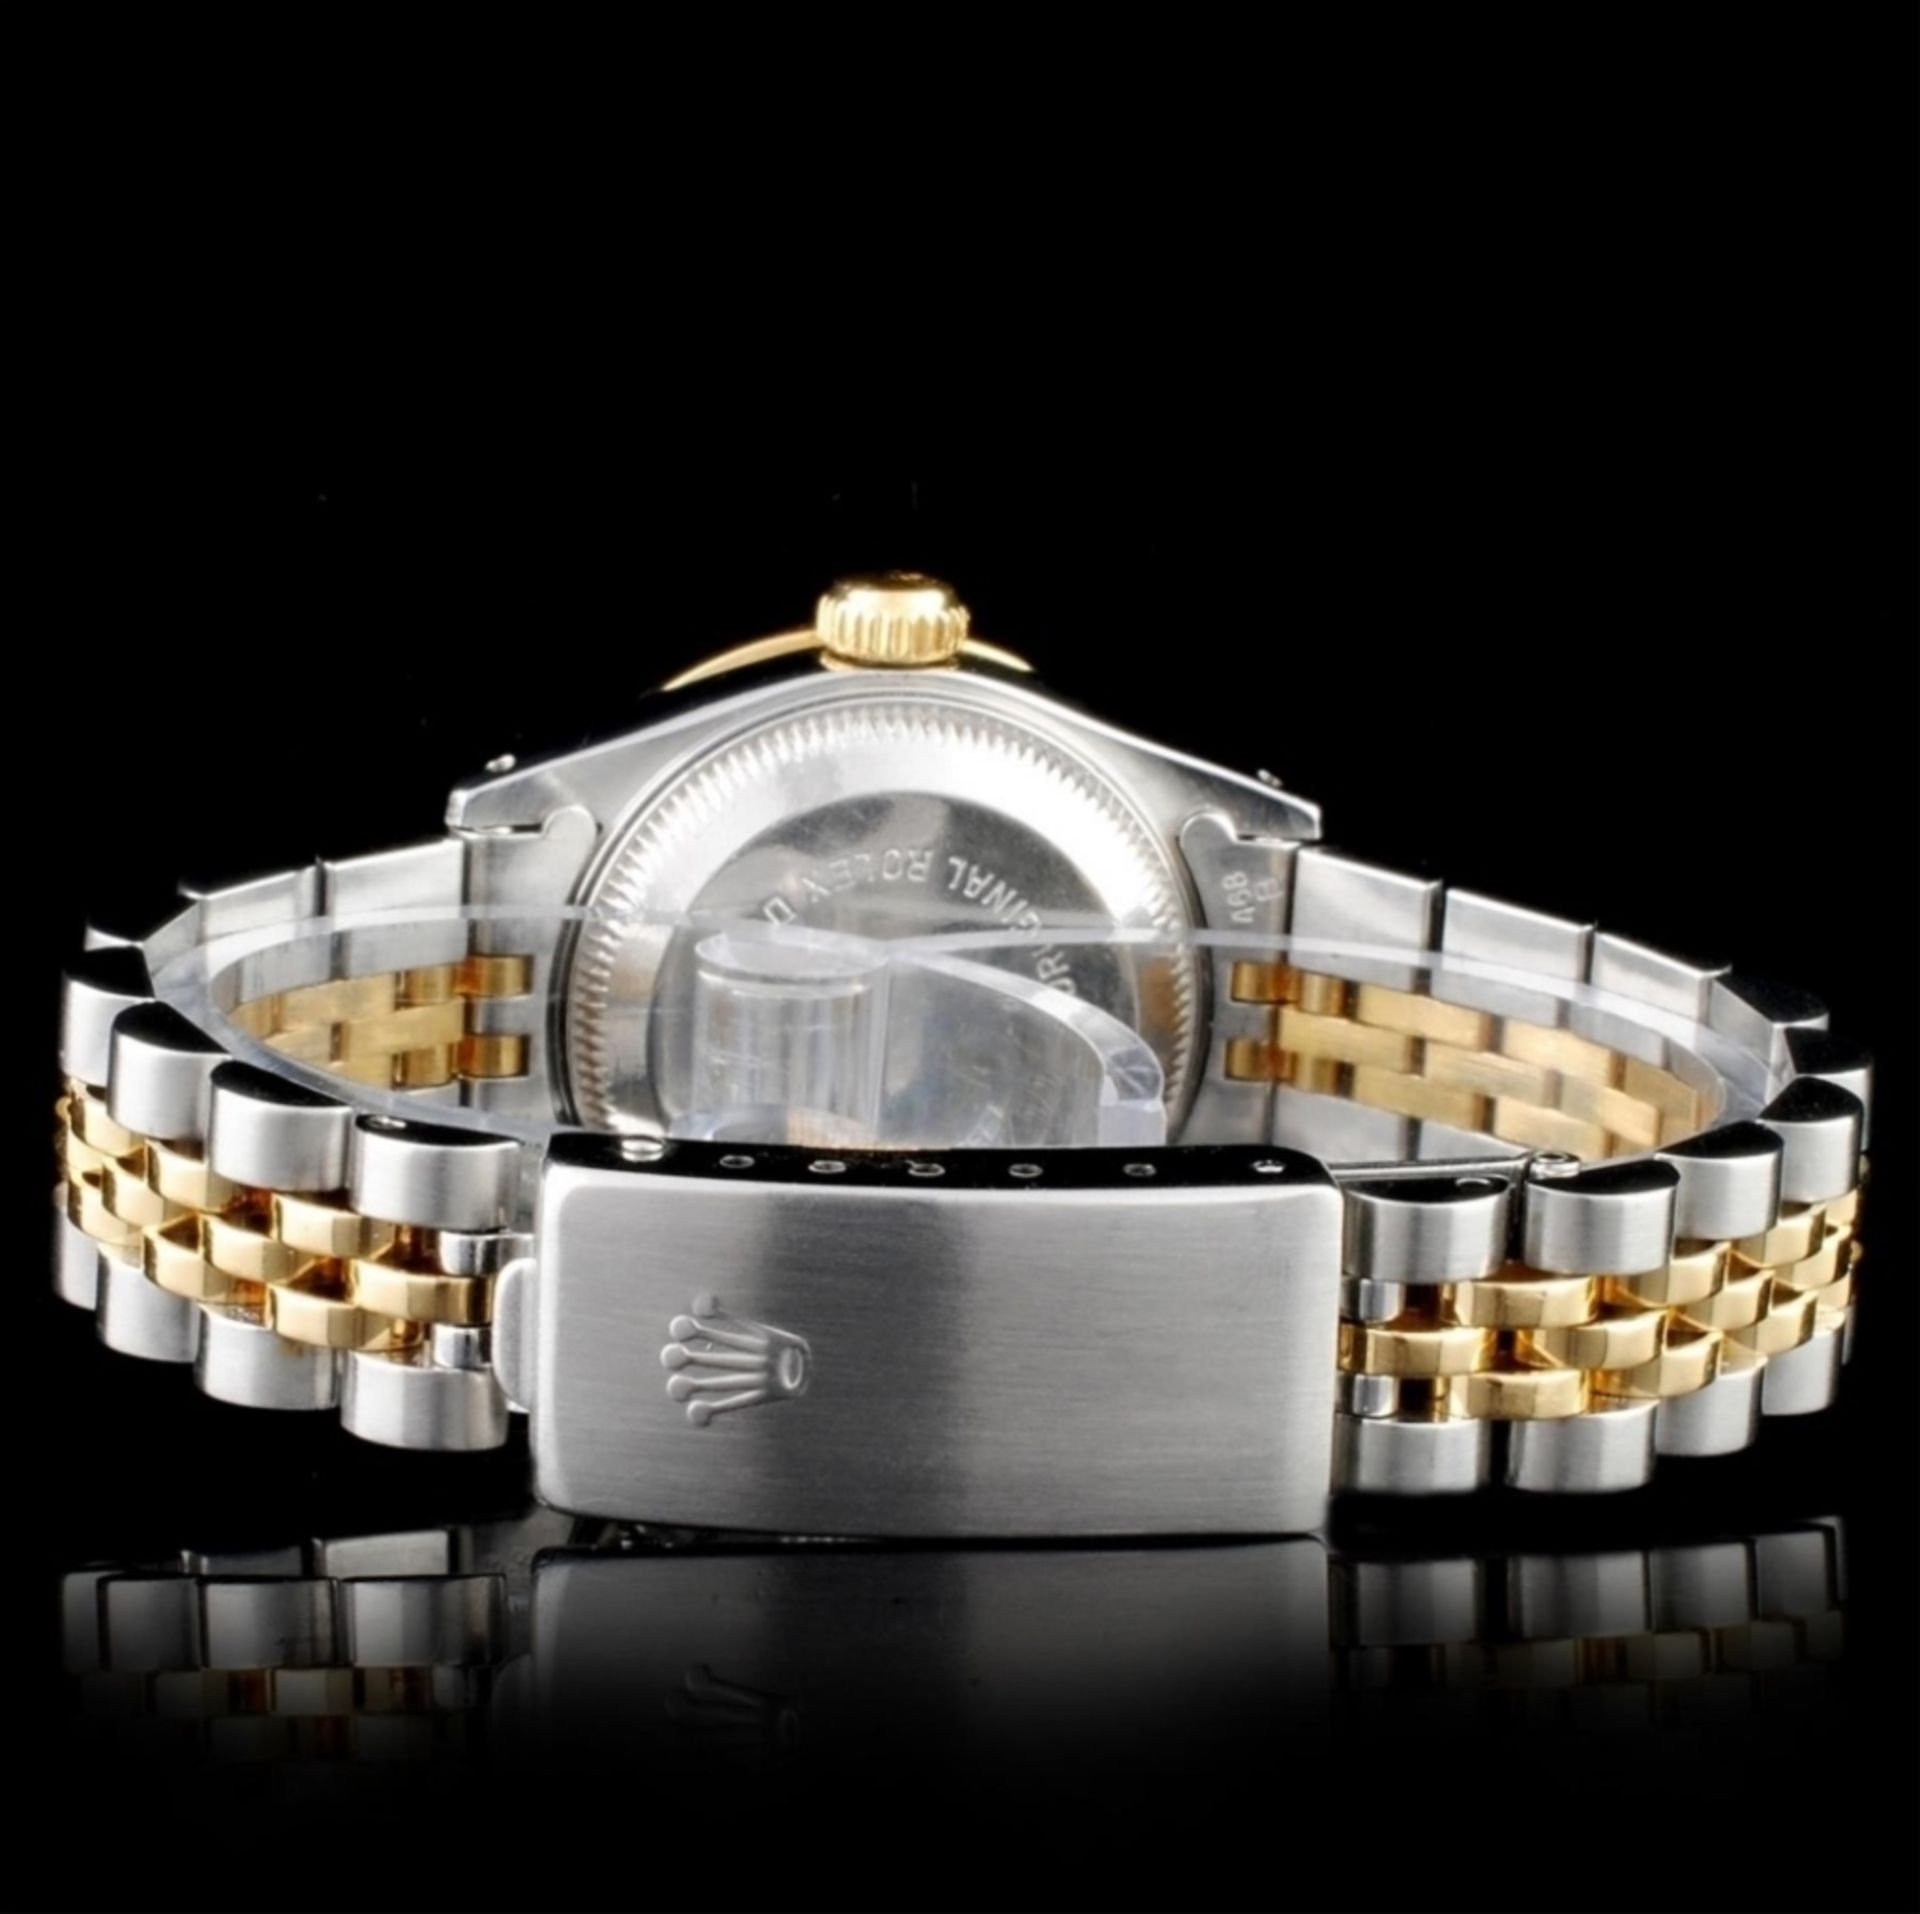 Rolex DateJust Diamond Ladies Watch - Image 3 of 5